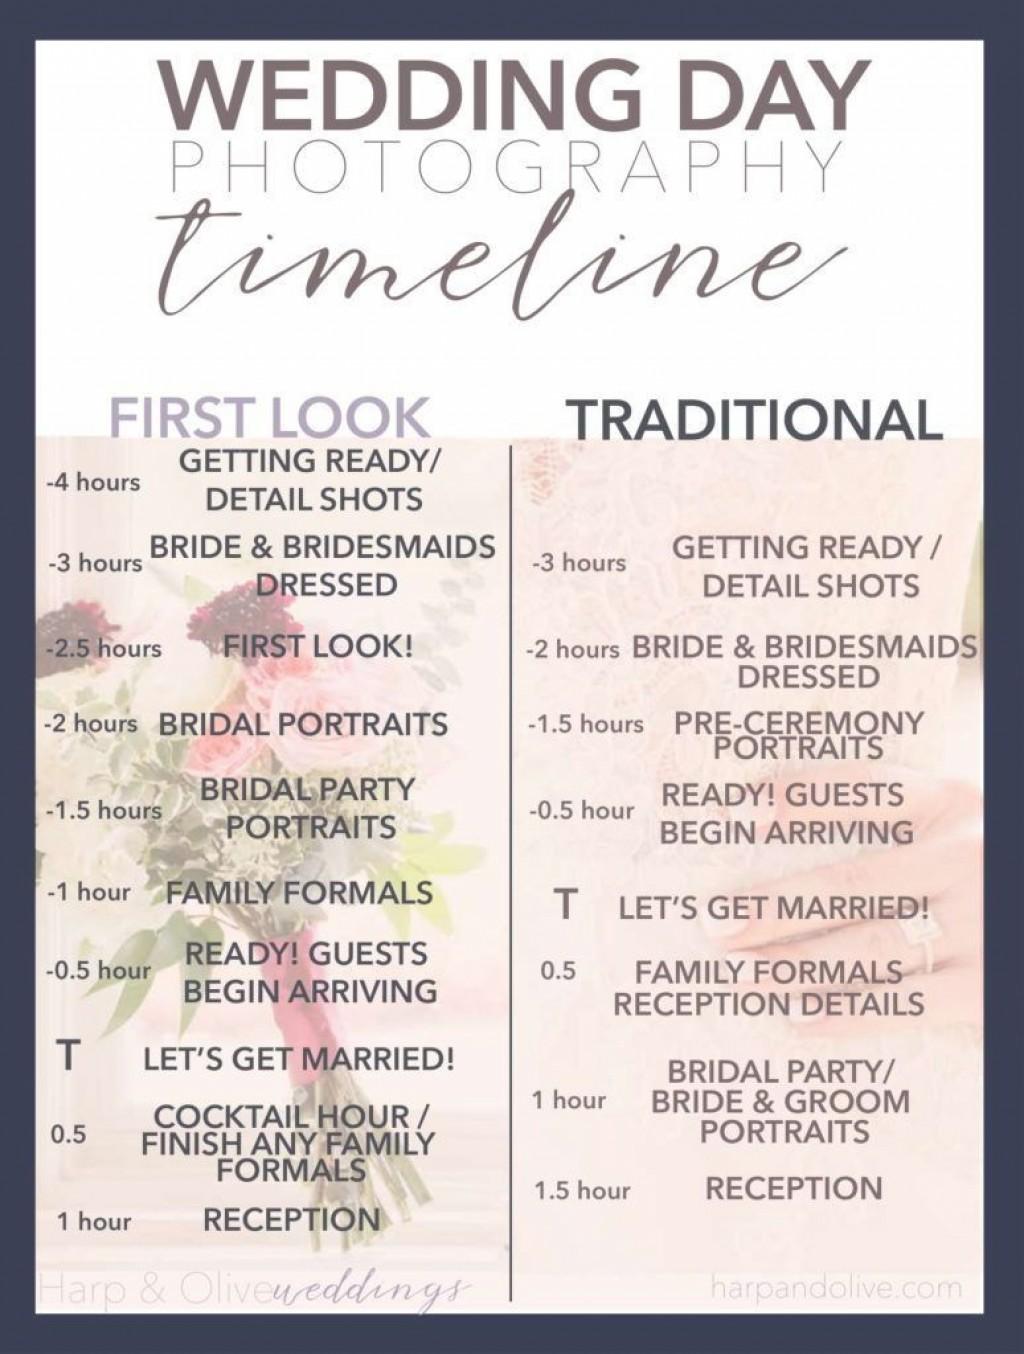 004 Impressive Wedding Timeline For Guest Template Free Example  DownloadLarge